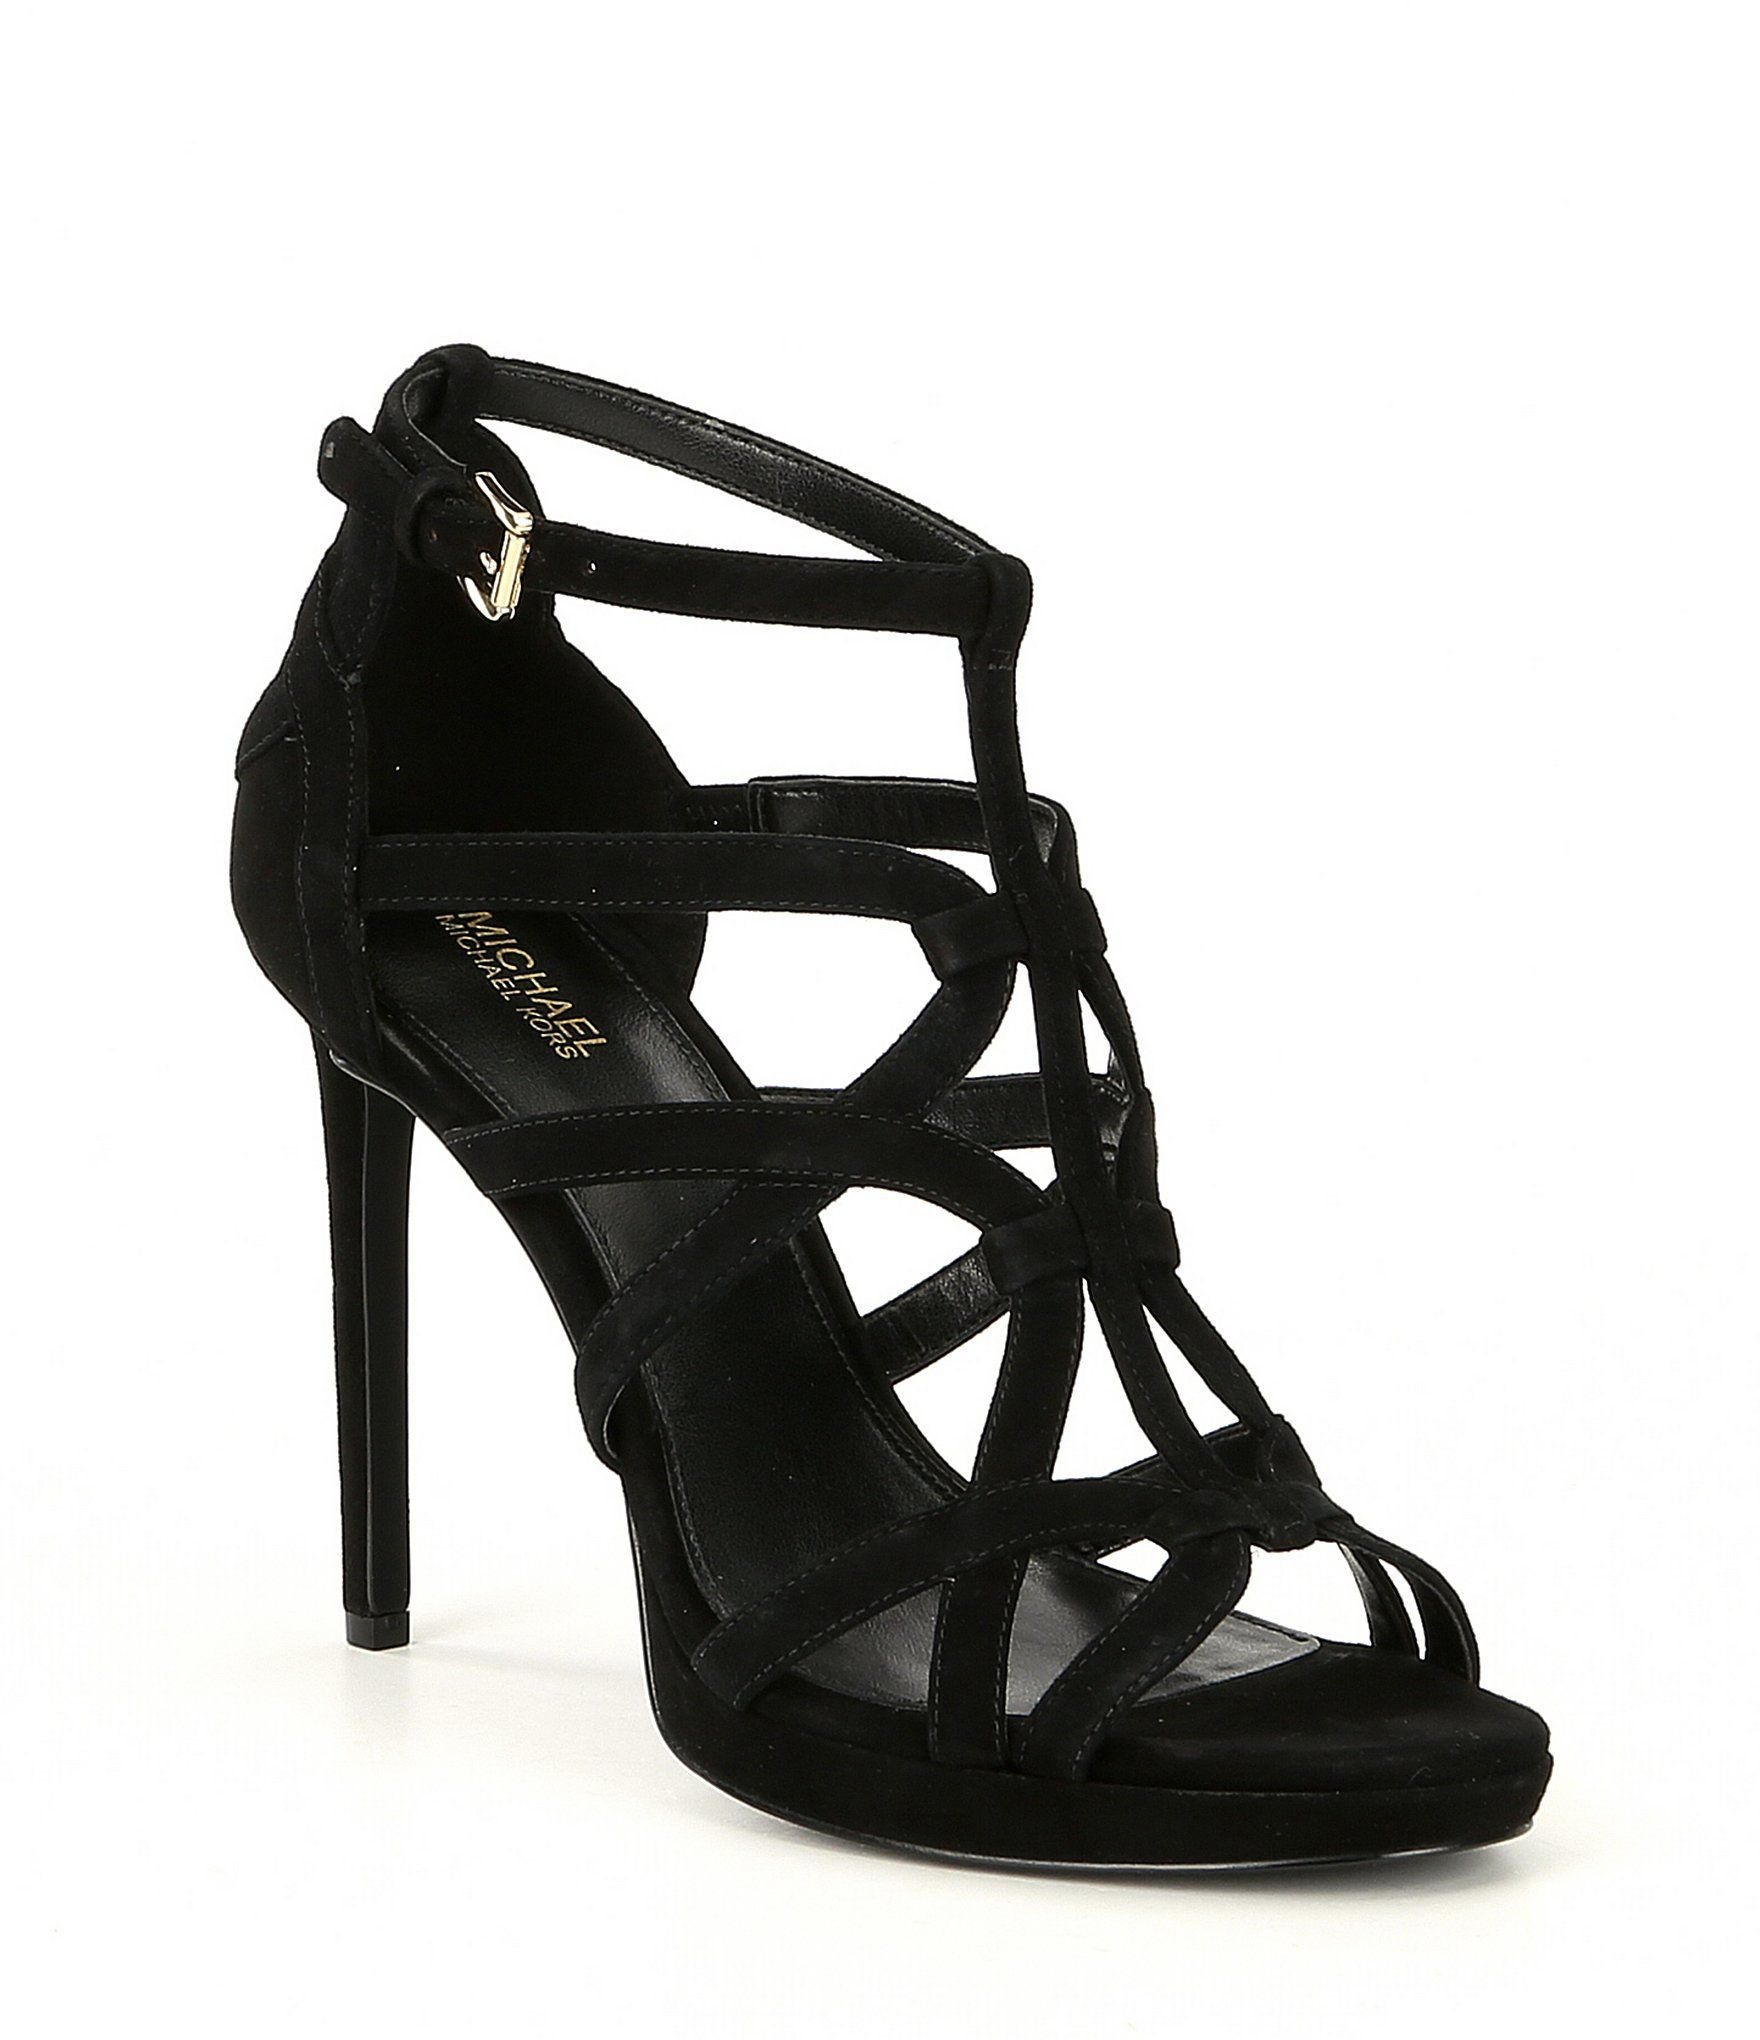 a2a0178349bc MICHAEL Michael Kors Sandra Suede Caged Platform Dress Sandals  Dillards